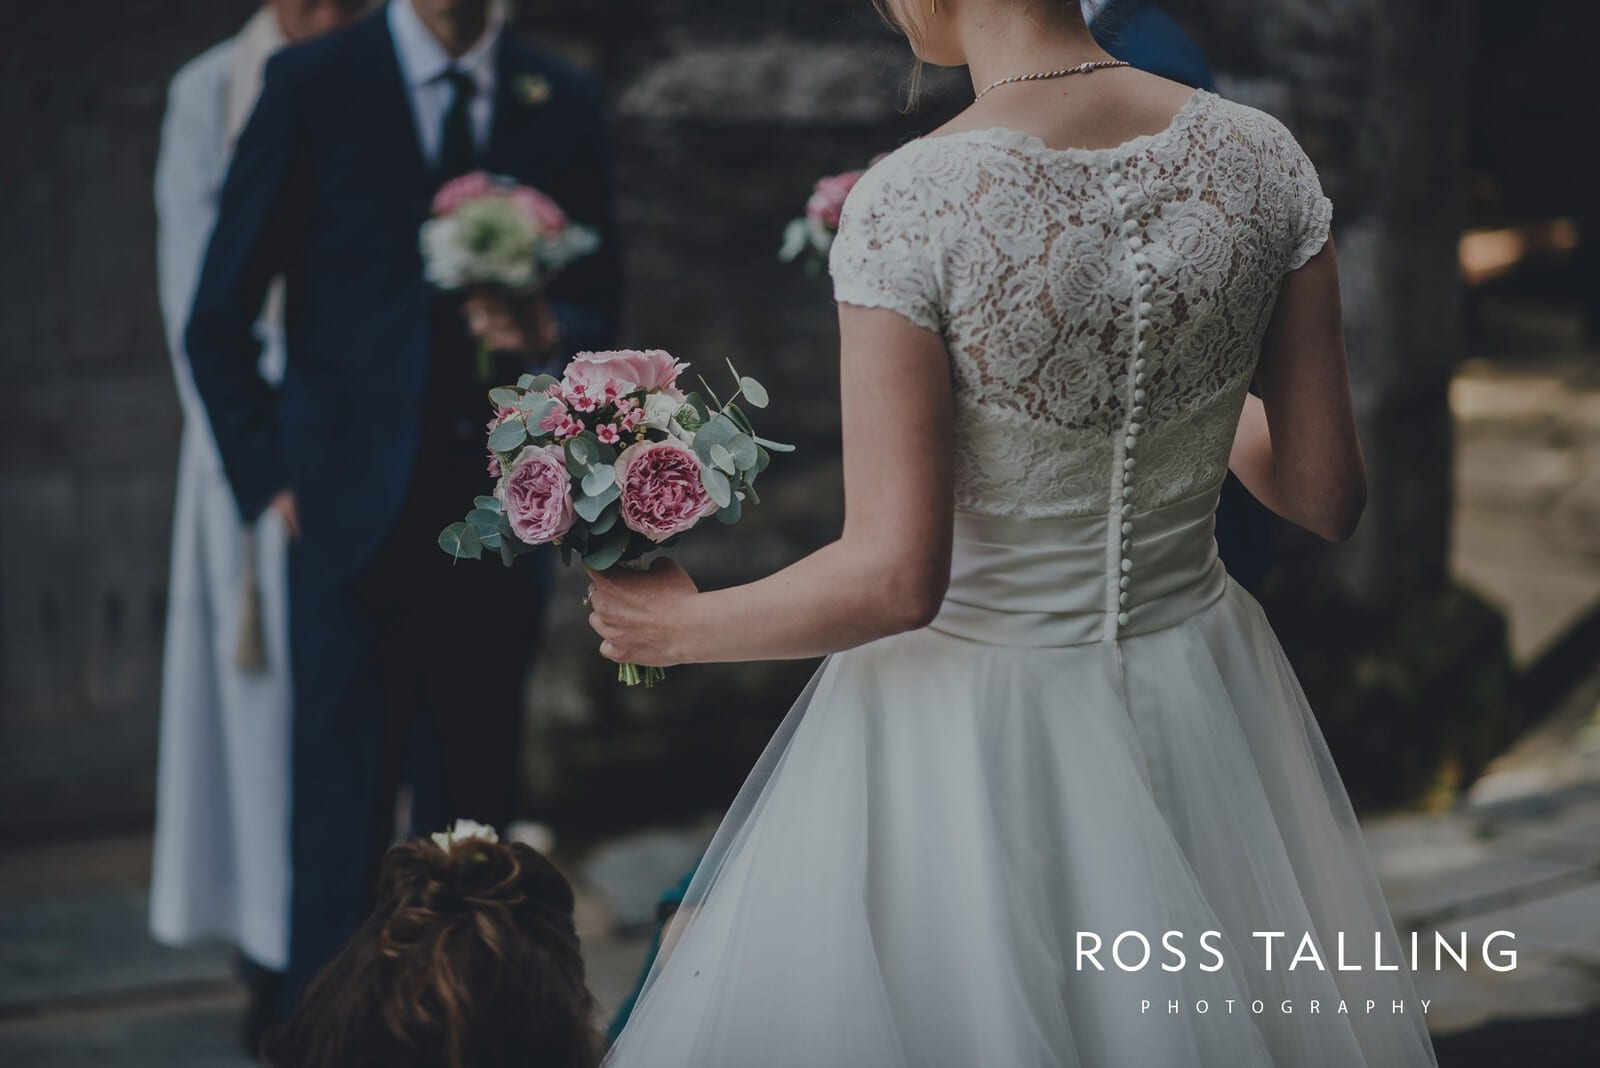 laura-matts-rosevine-hotel-wedding-photography-cornwall_0056